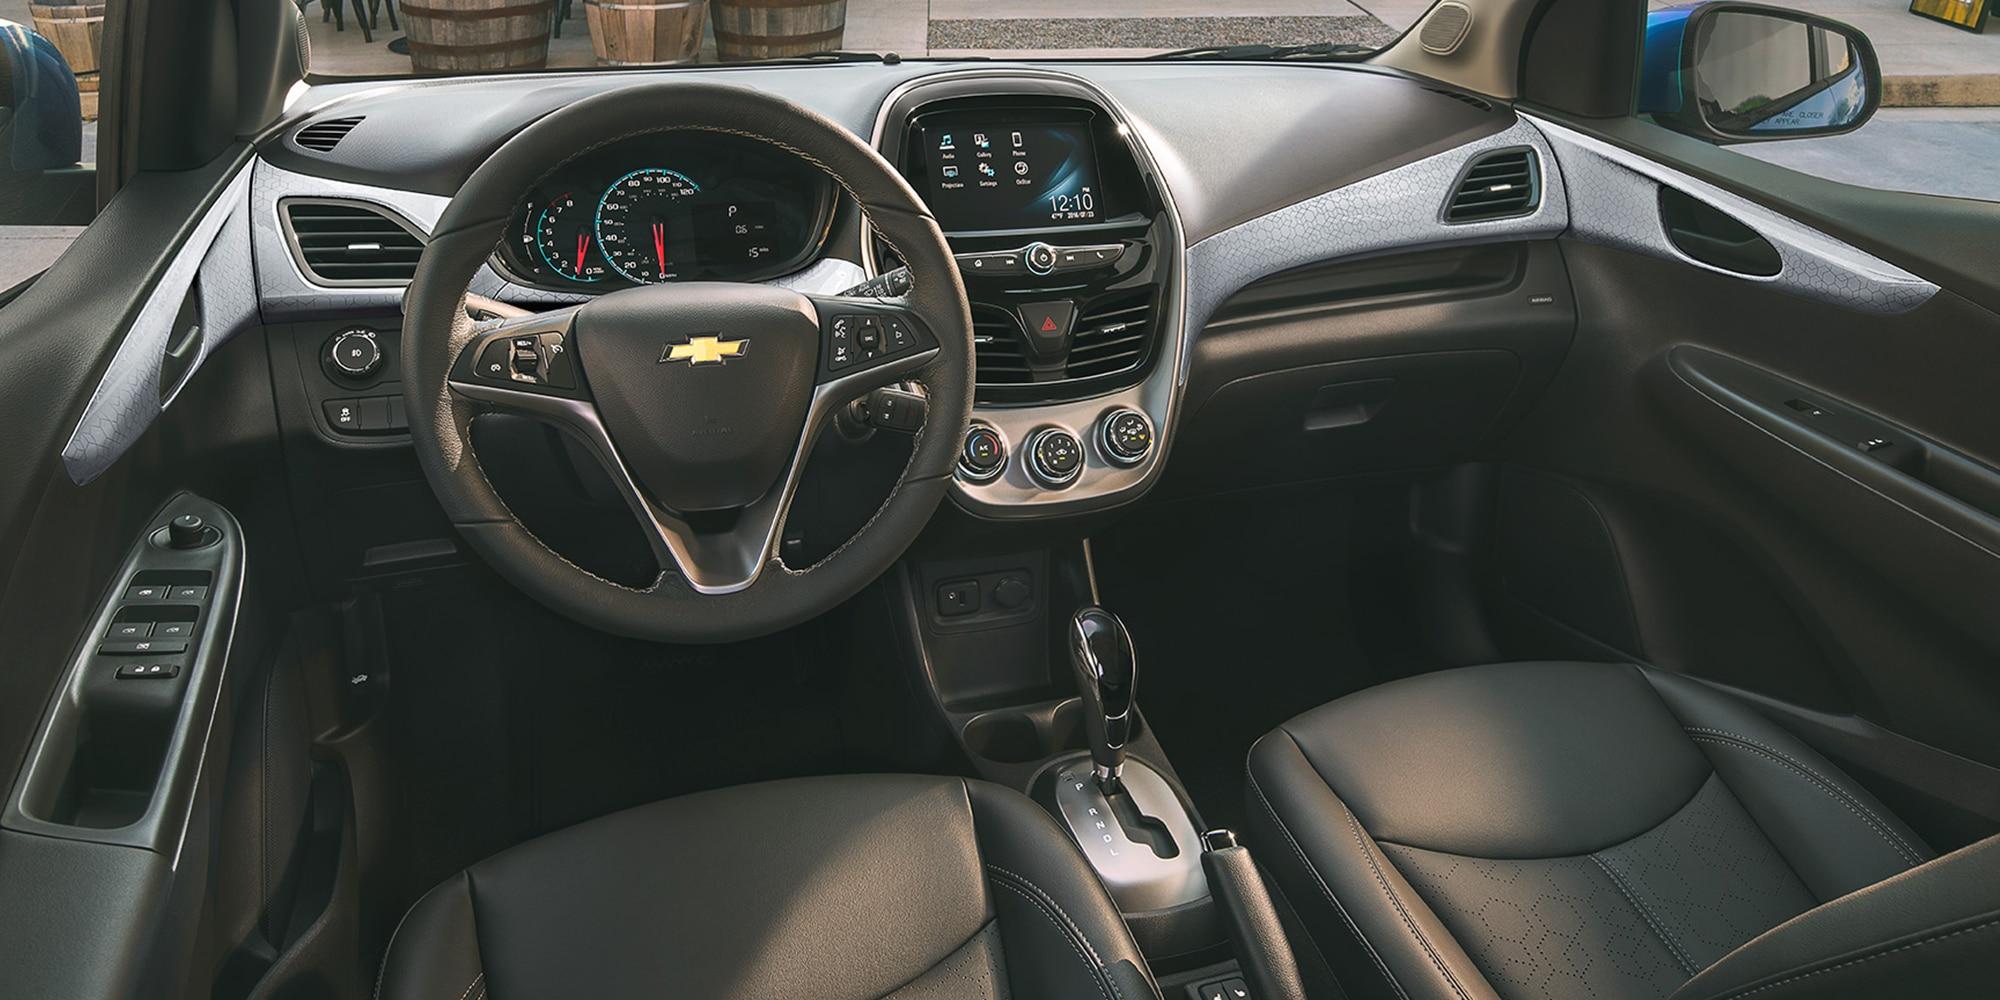 Auto urbano Chevrolet Spark ACTIV 2018: interior